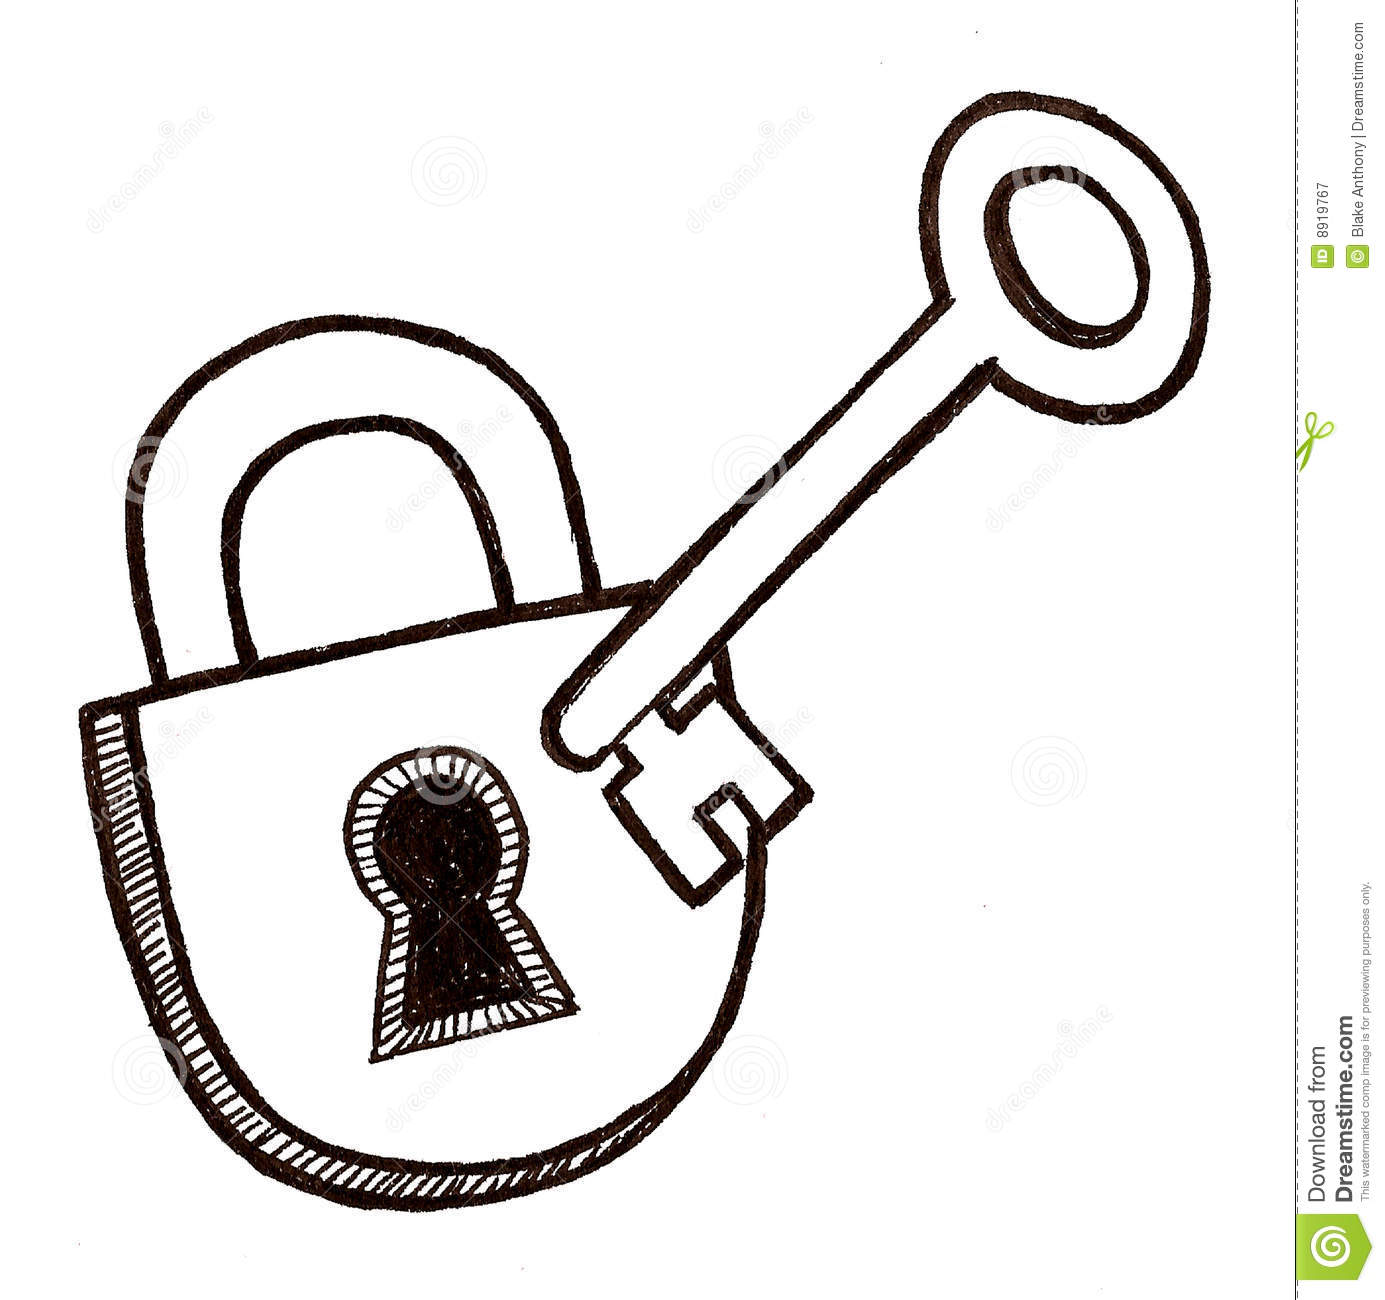 padlock and key clipart - photo #13